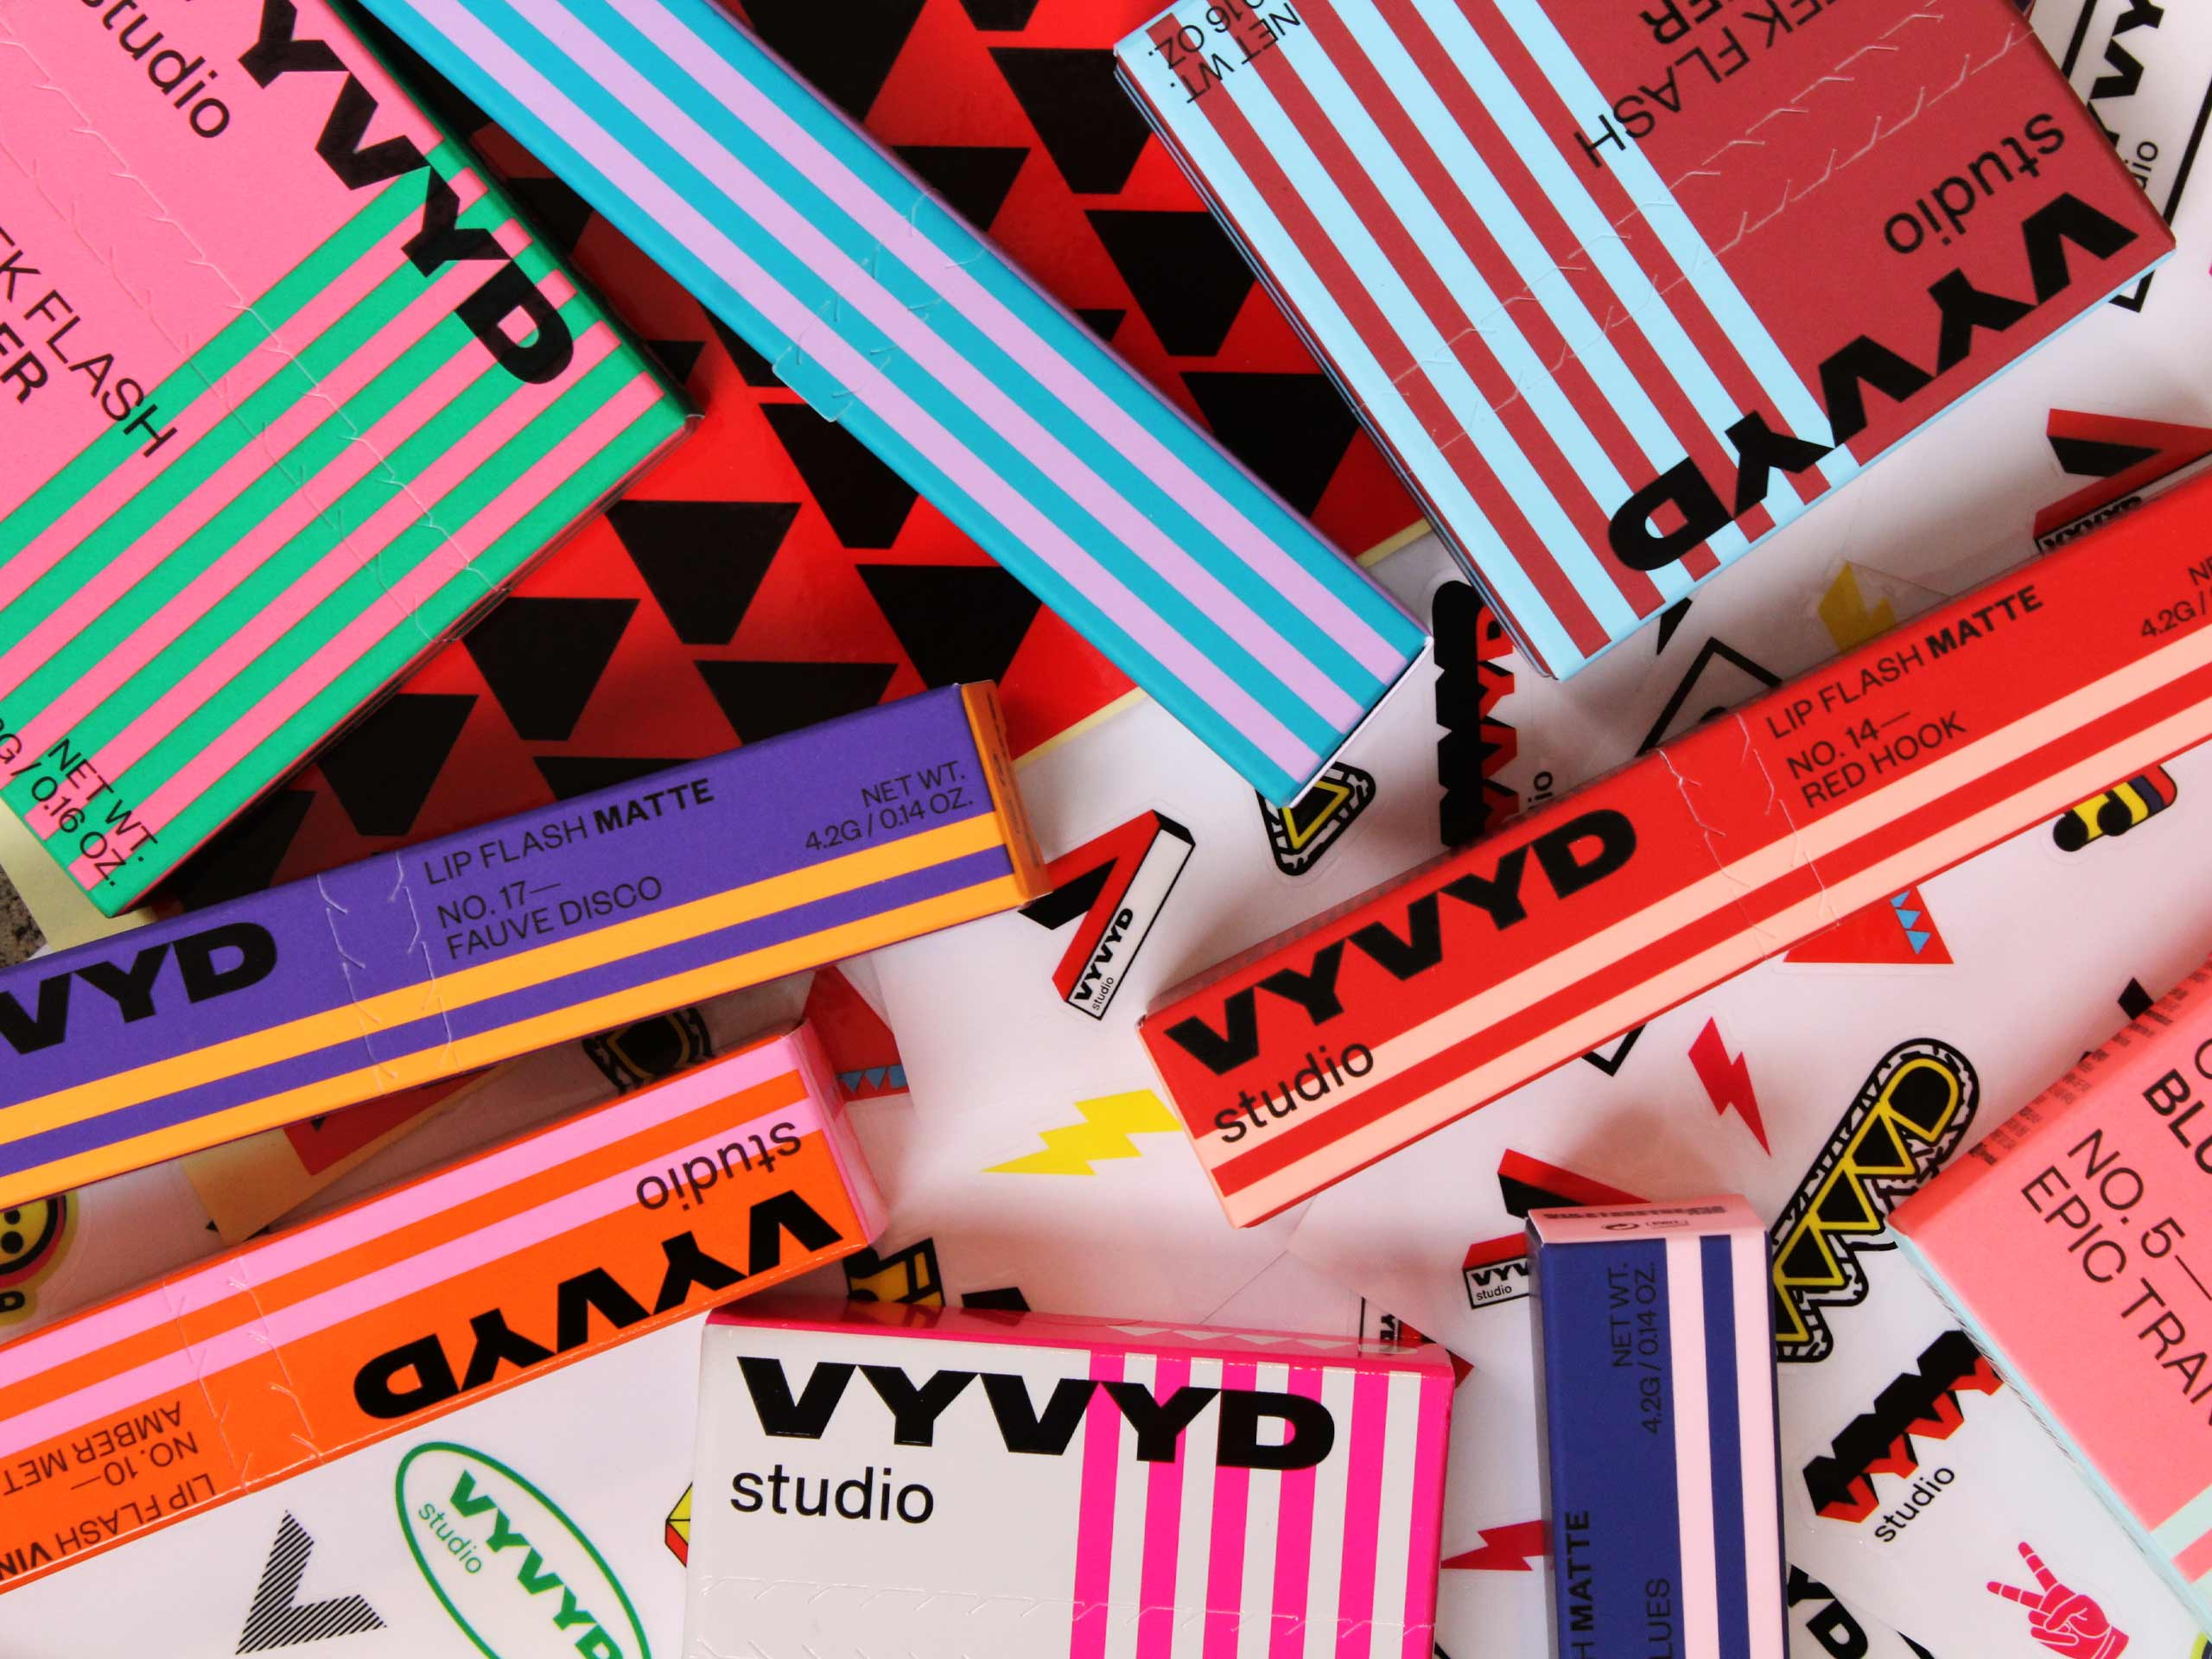 VYVYD Studio